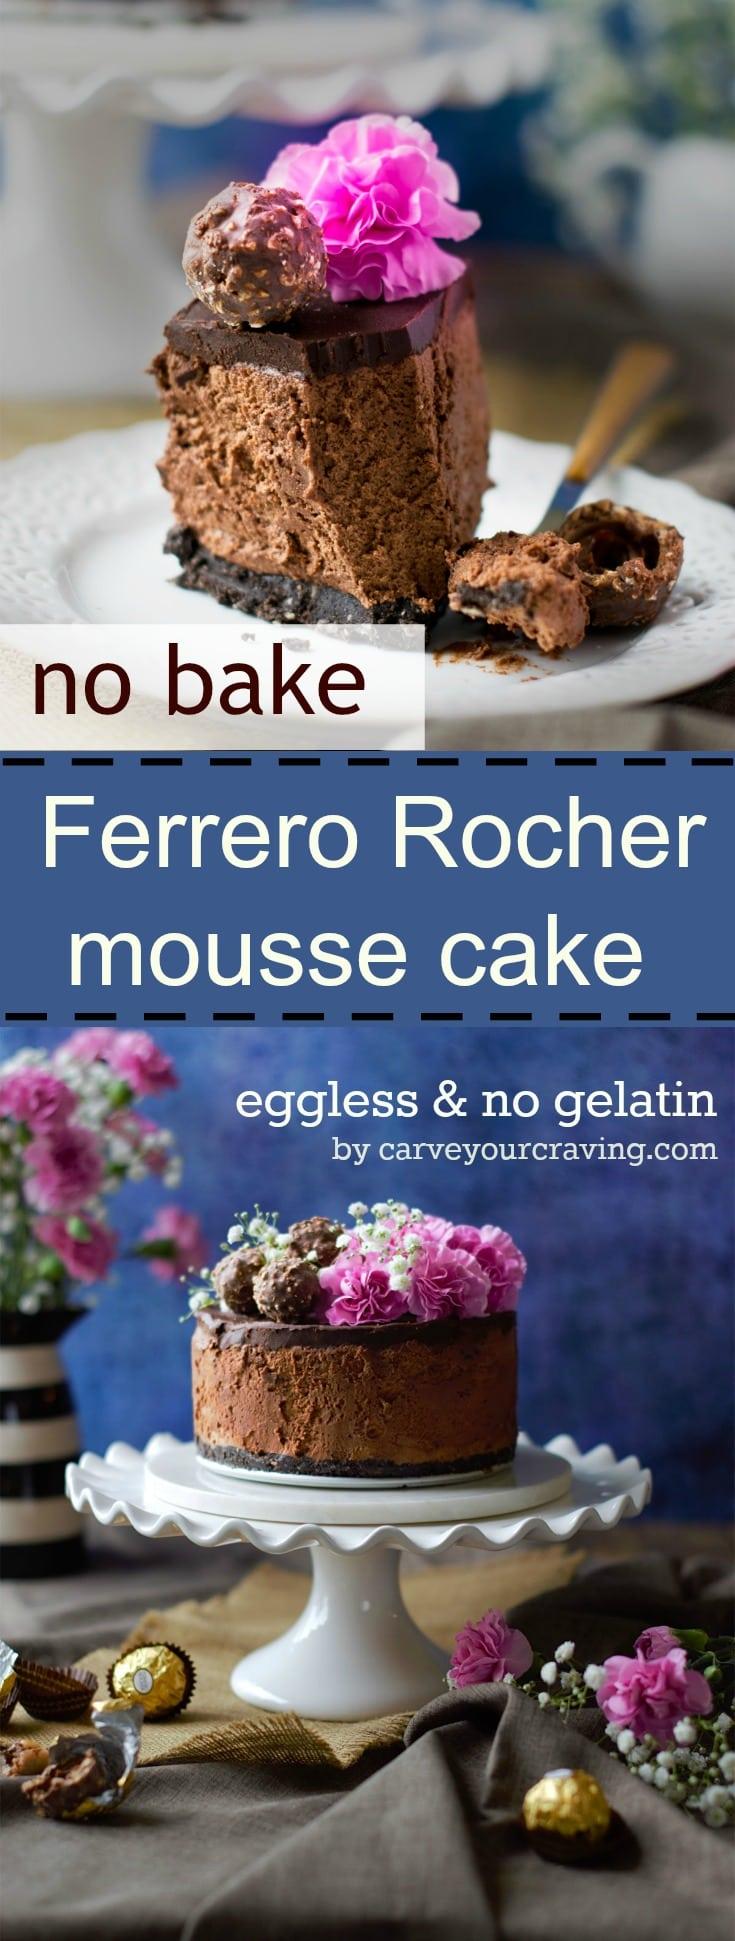 No bake eggless ferrero rocher mousse cake